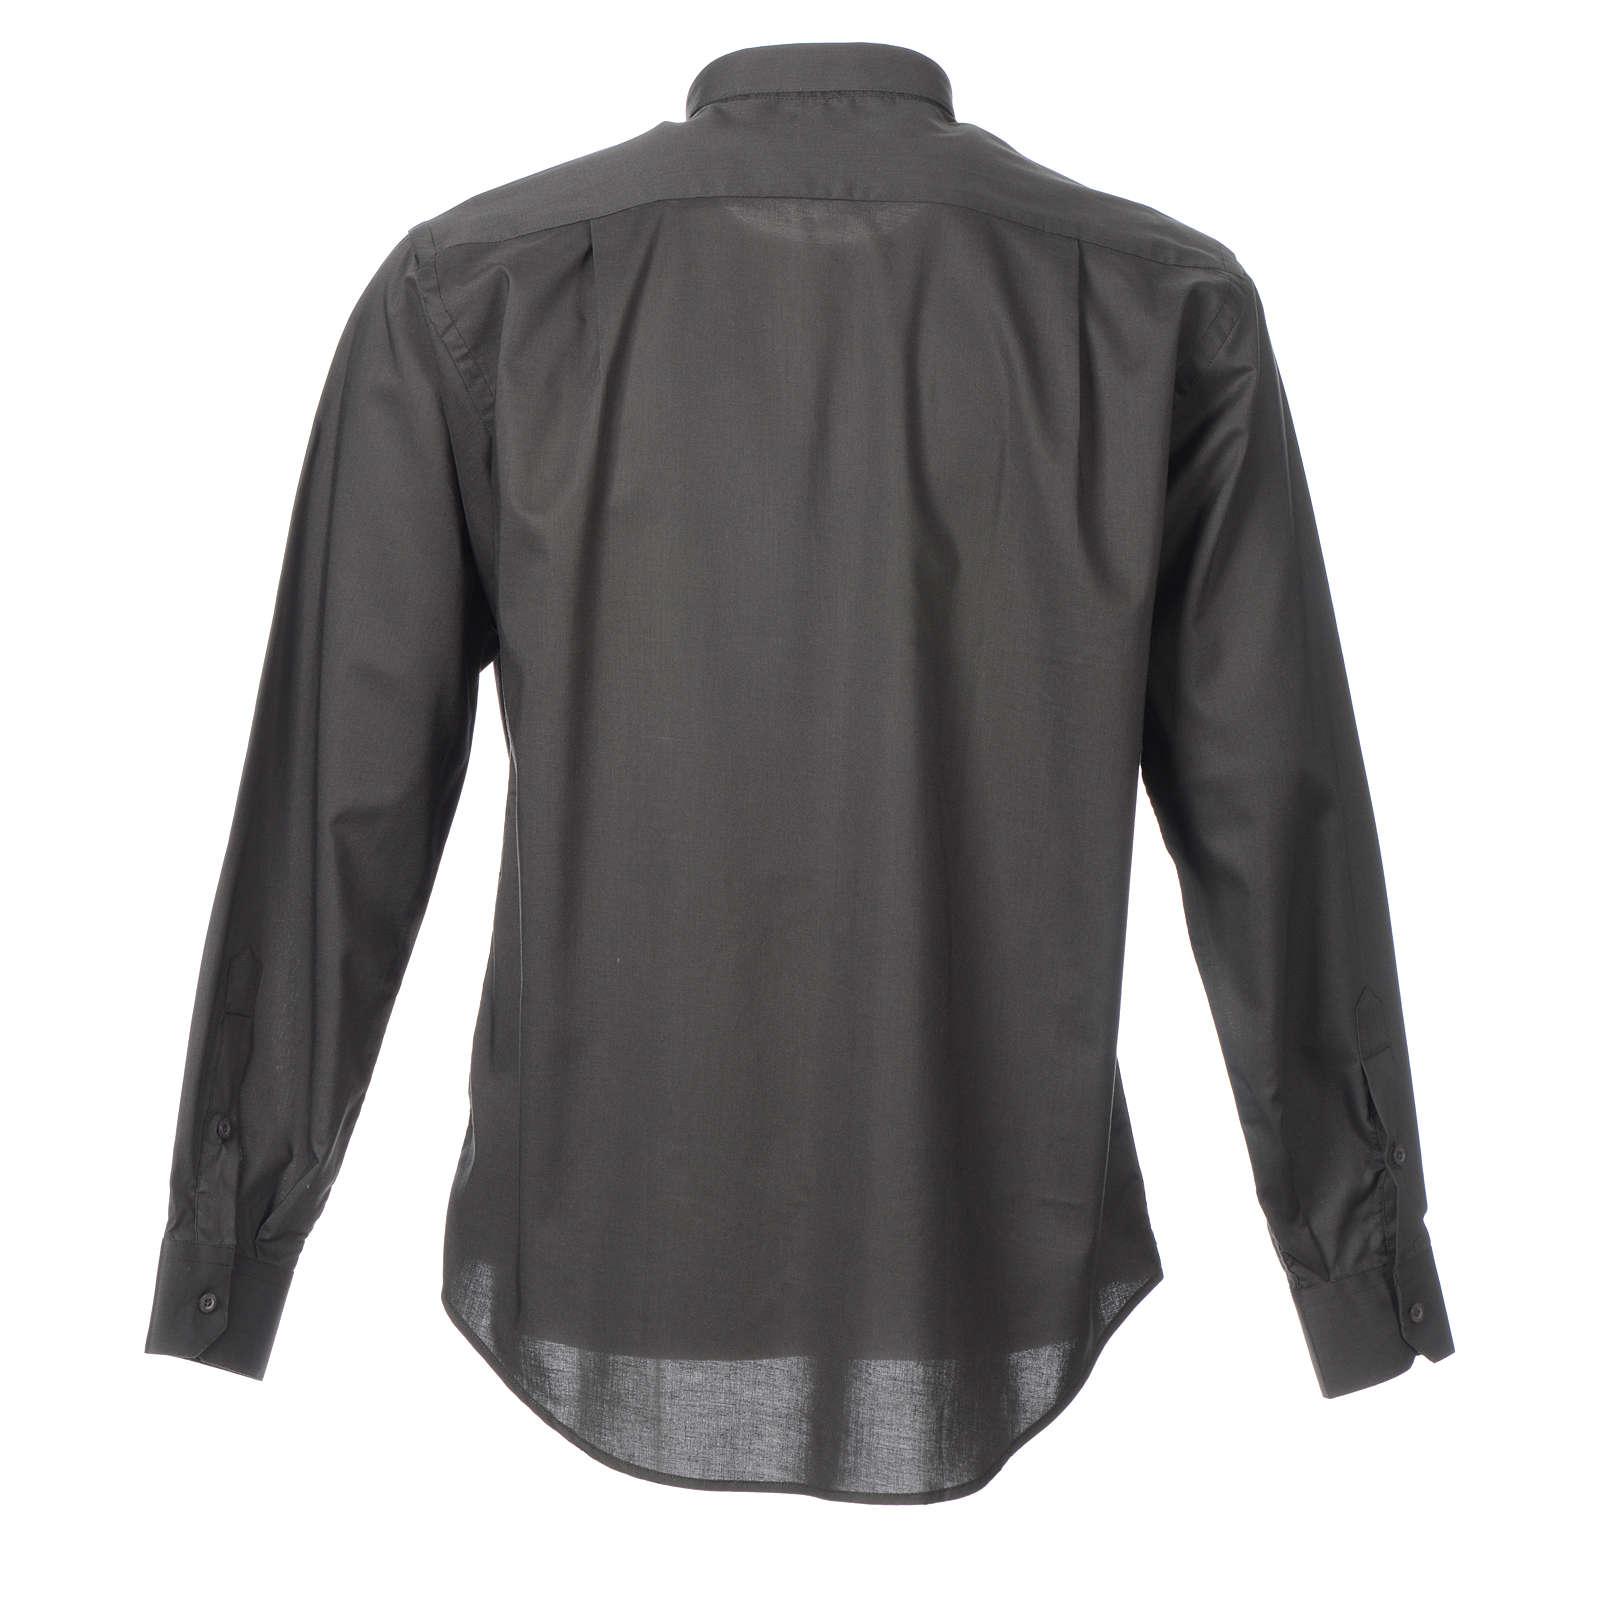 STOCK Camisa clergyman manga longa misto cinzento escuro 4